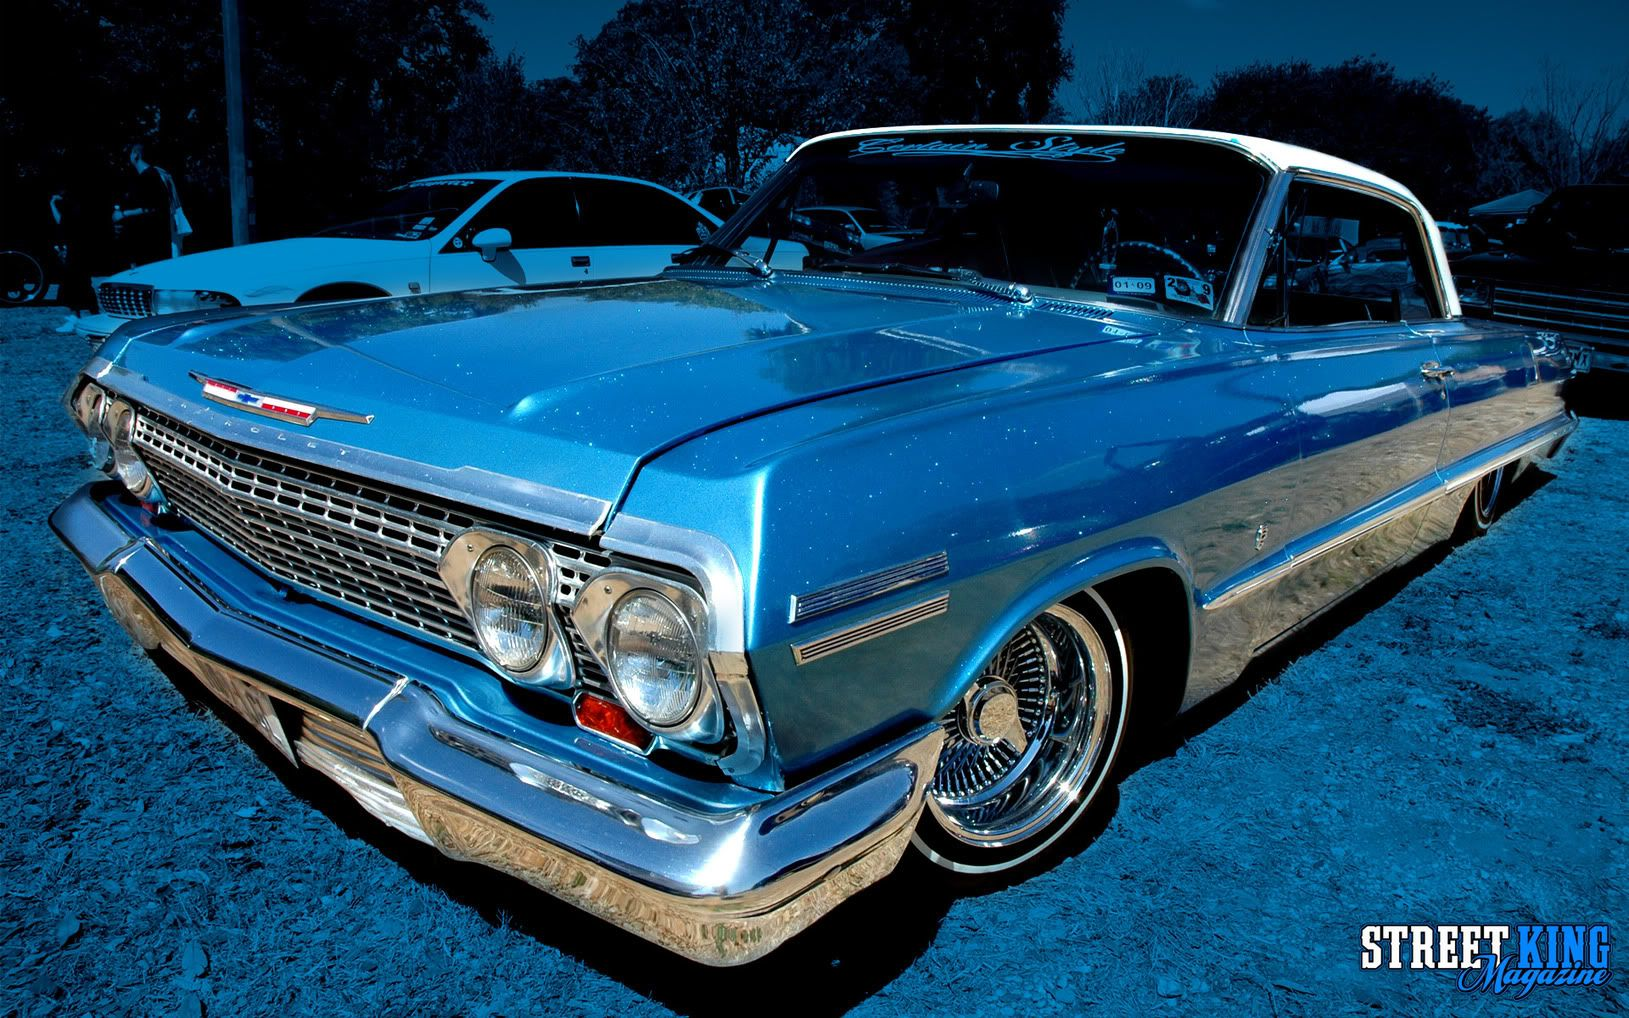 Lowrider Wallpaper Lowriders, Lowrider cars, 64 impala